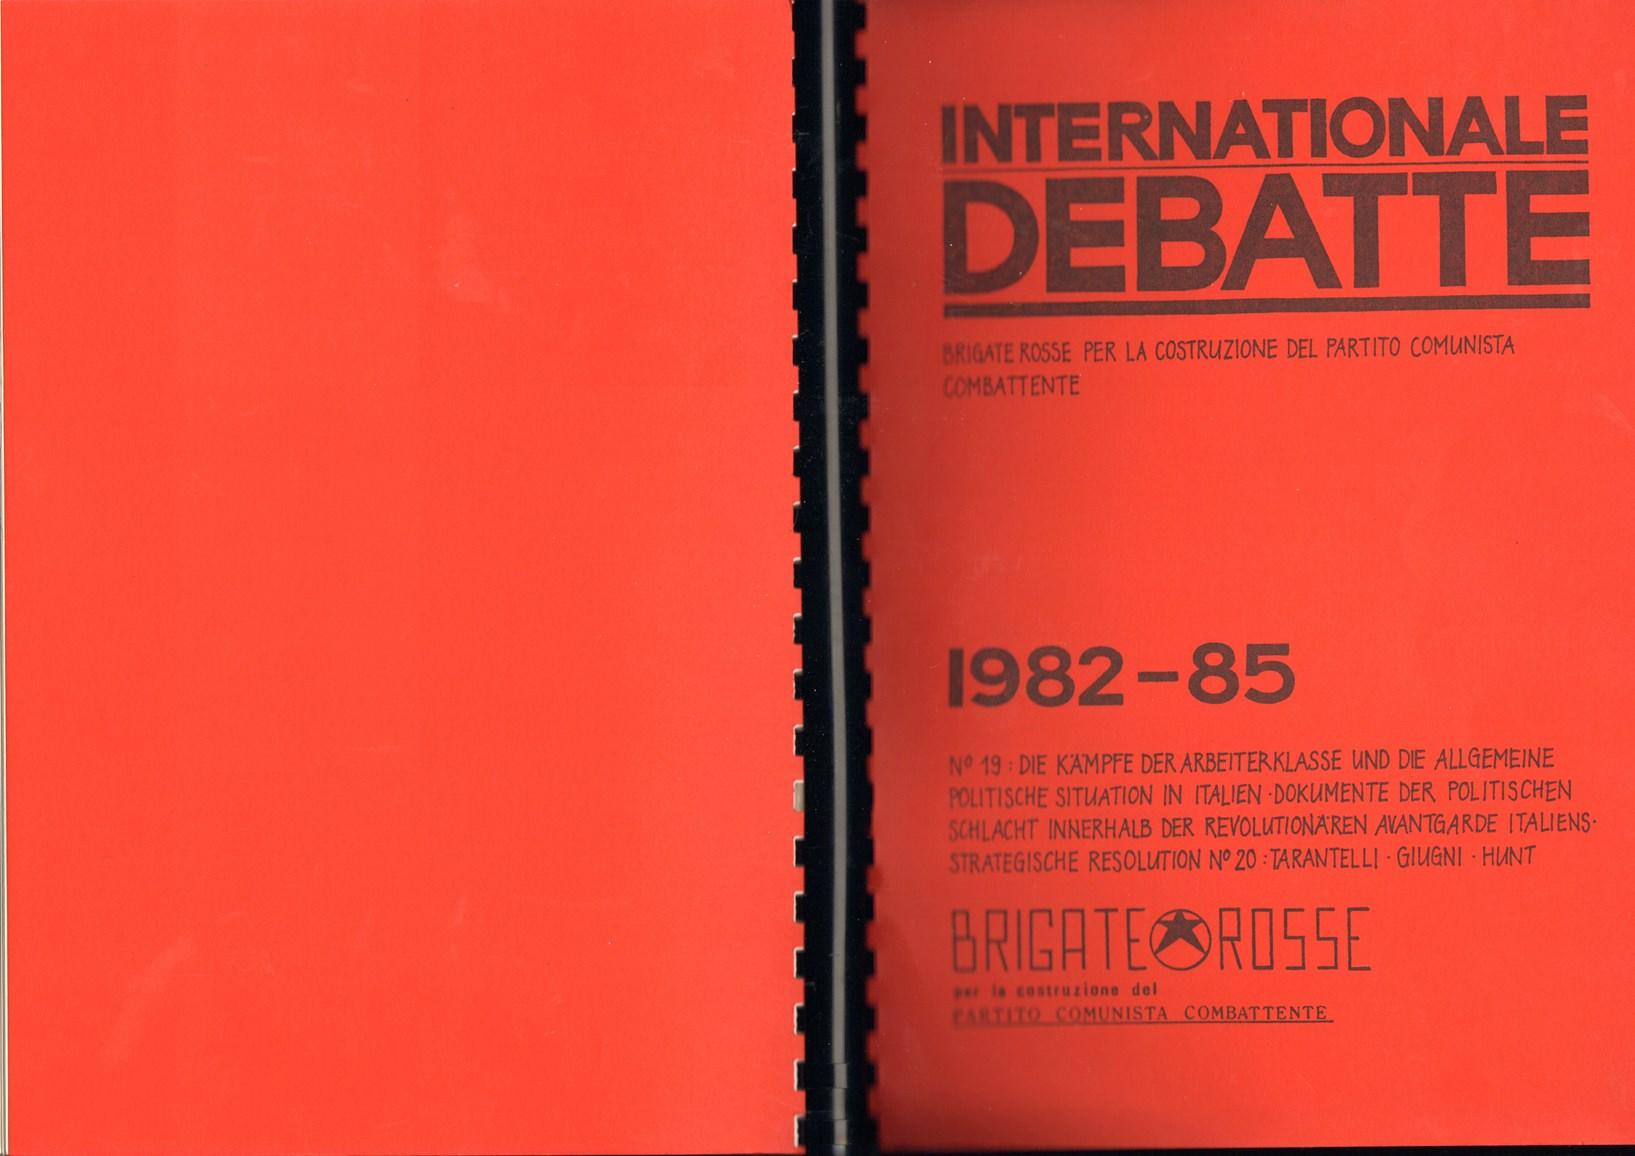 Internationale_Debatte_1985_Brigate_Rosse_001